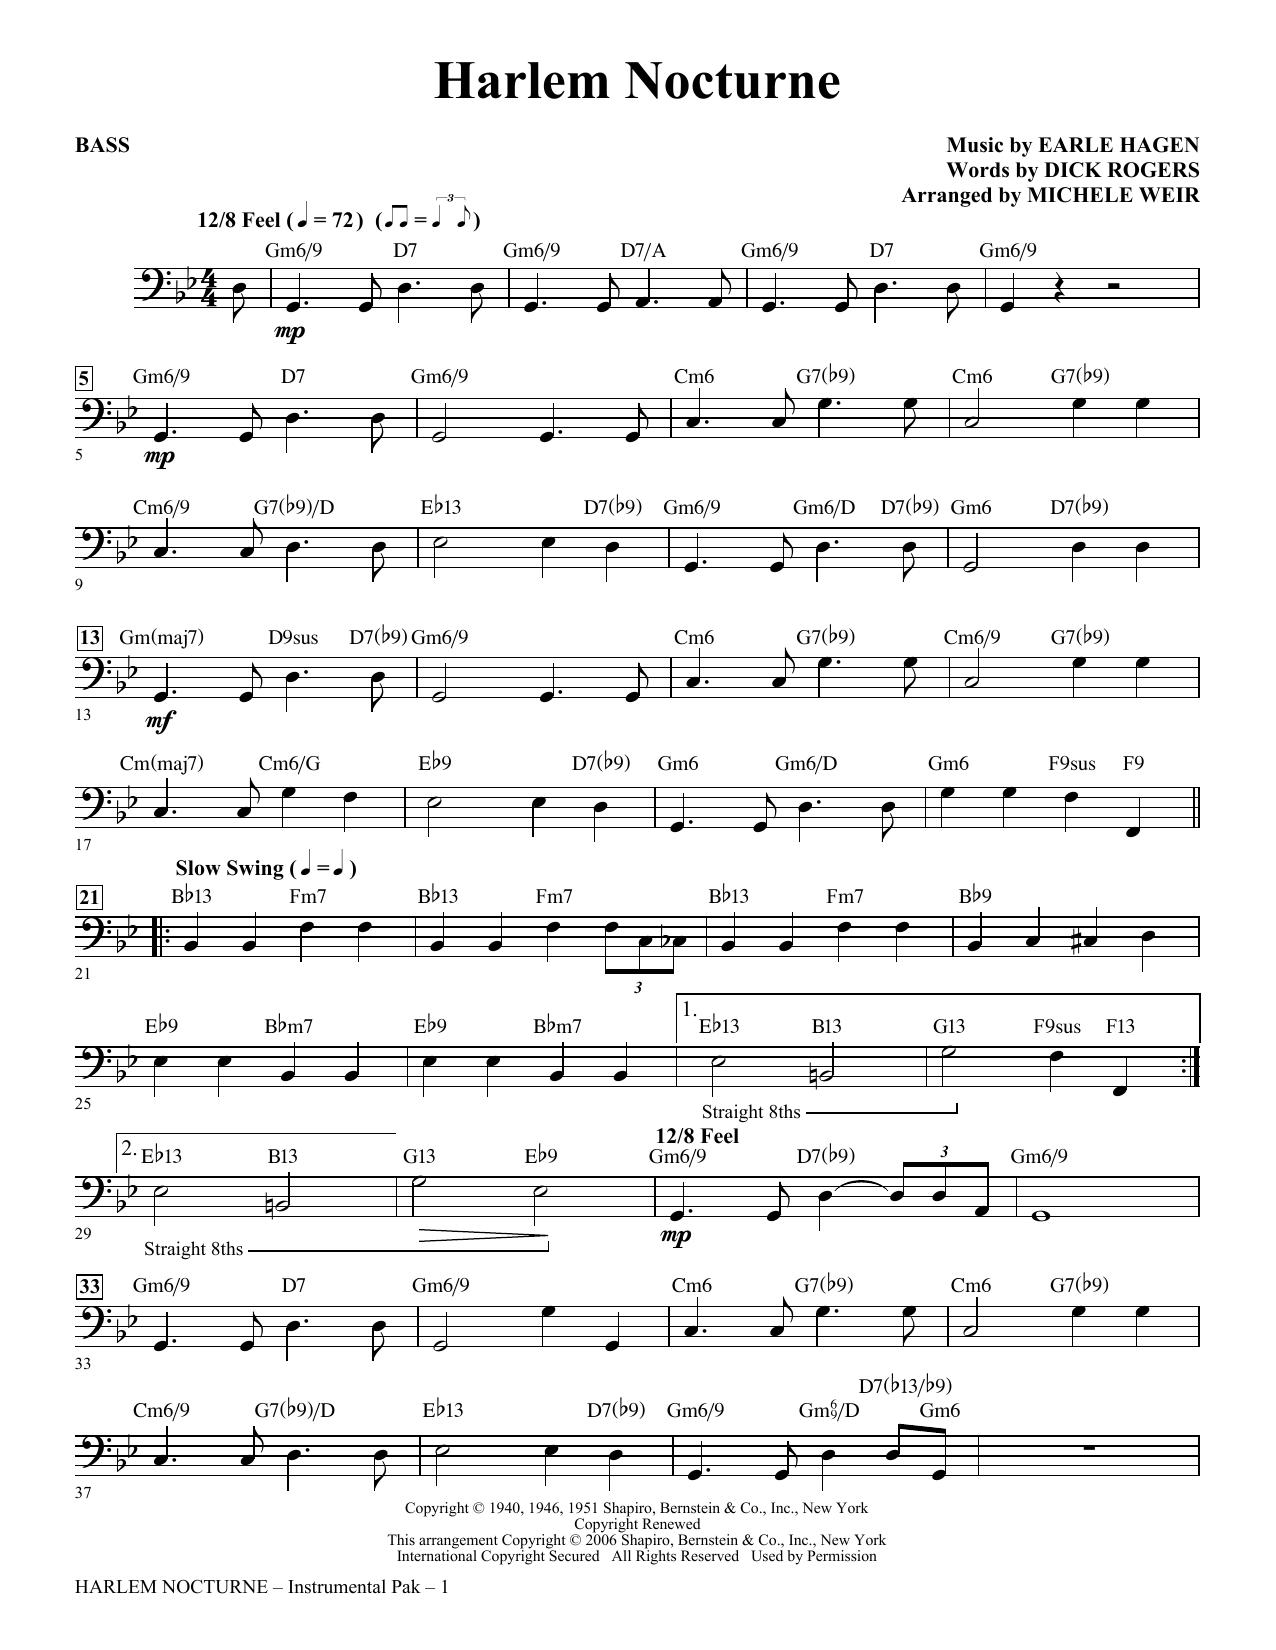 Harlem Nocturne (arr. Michele Weir) - Bass Partition Digitale